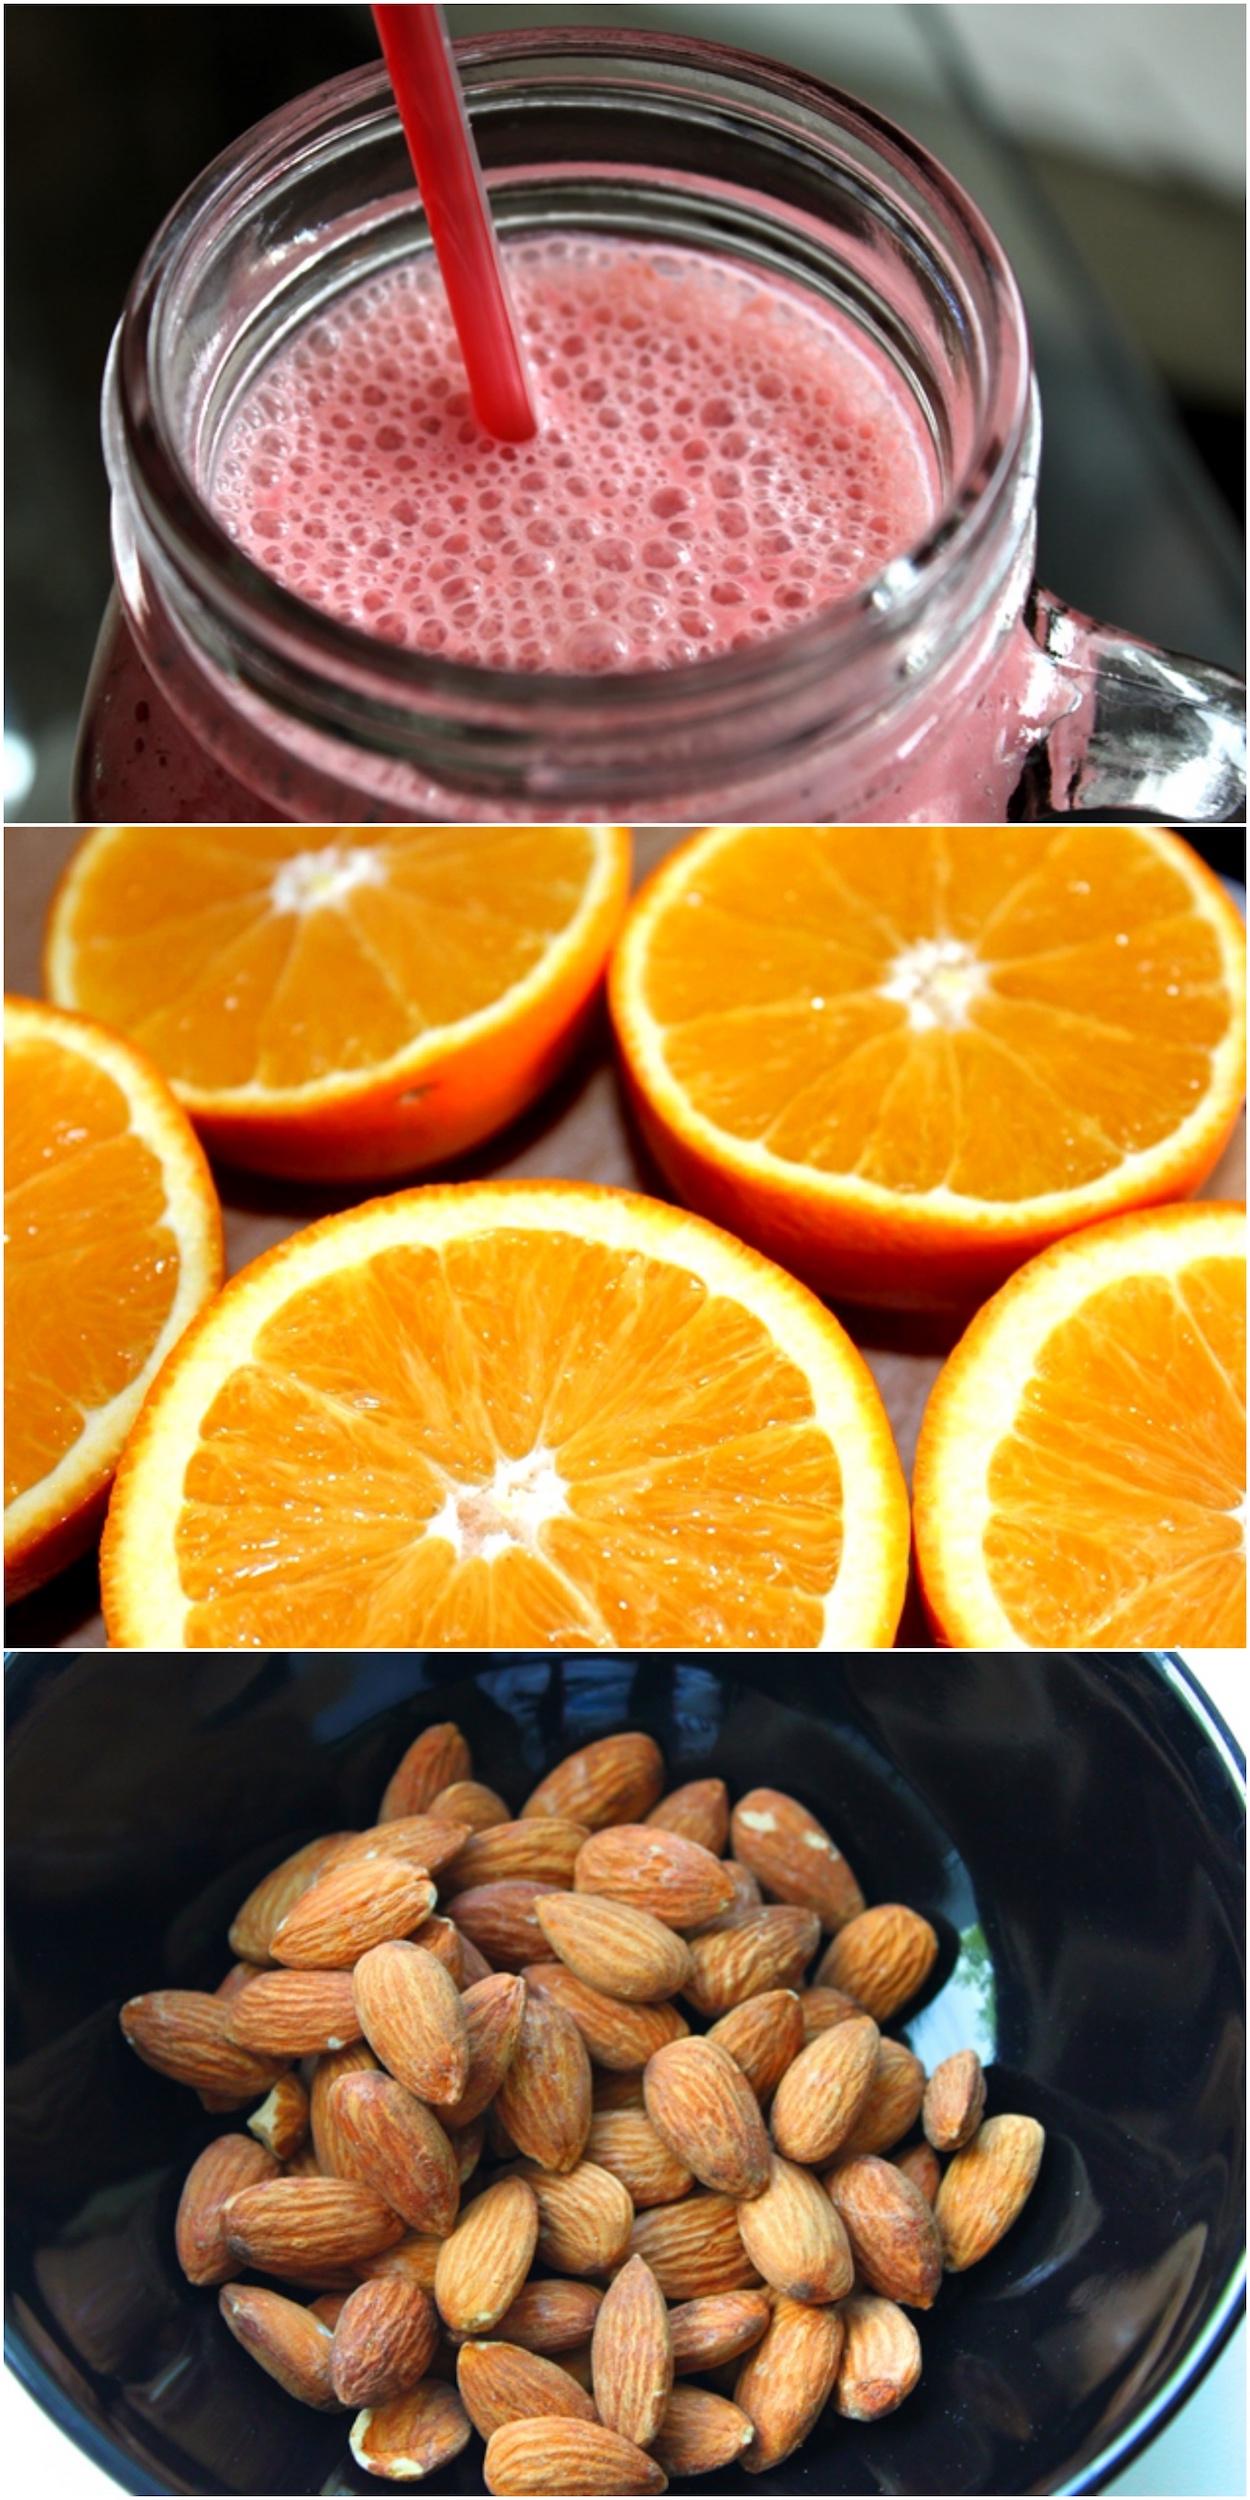 Healthy food for beautiful skin